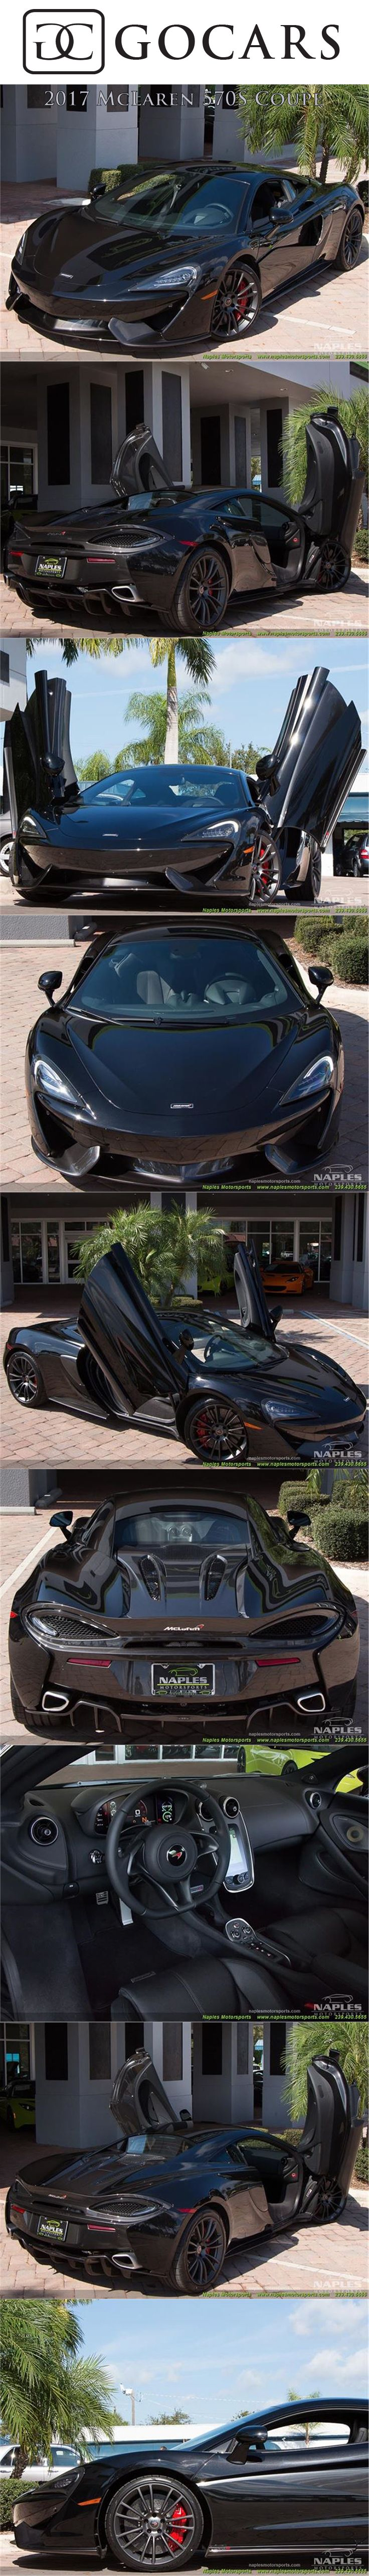 Onyx Black Exterior, Carbon Black Interior, 3.8L Twin Turbo V8, 562 hp, 7 Speed McLaren Dual Clutch Seamless Shift Gearbox (SSG). Only 100 Miles!  #mclaren #mclaren570s #supercar #supercars #sportscar #sportscars #luxurycar #luxurycars #mclarenphotos #gocars